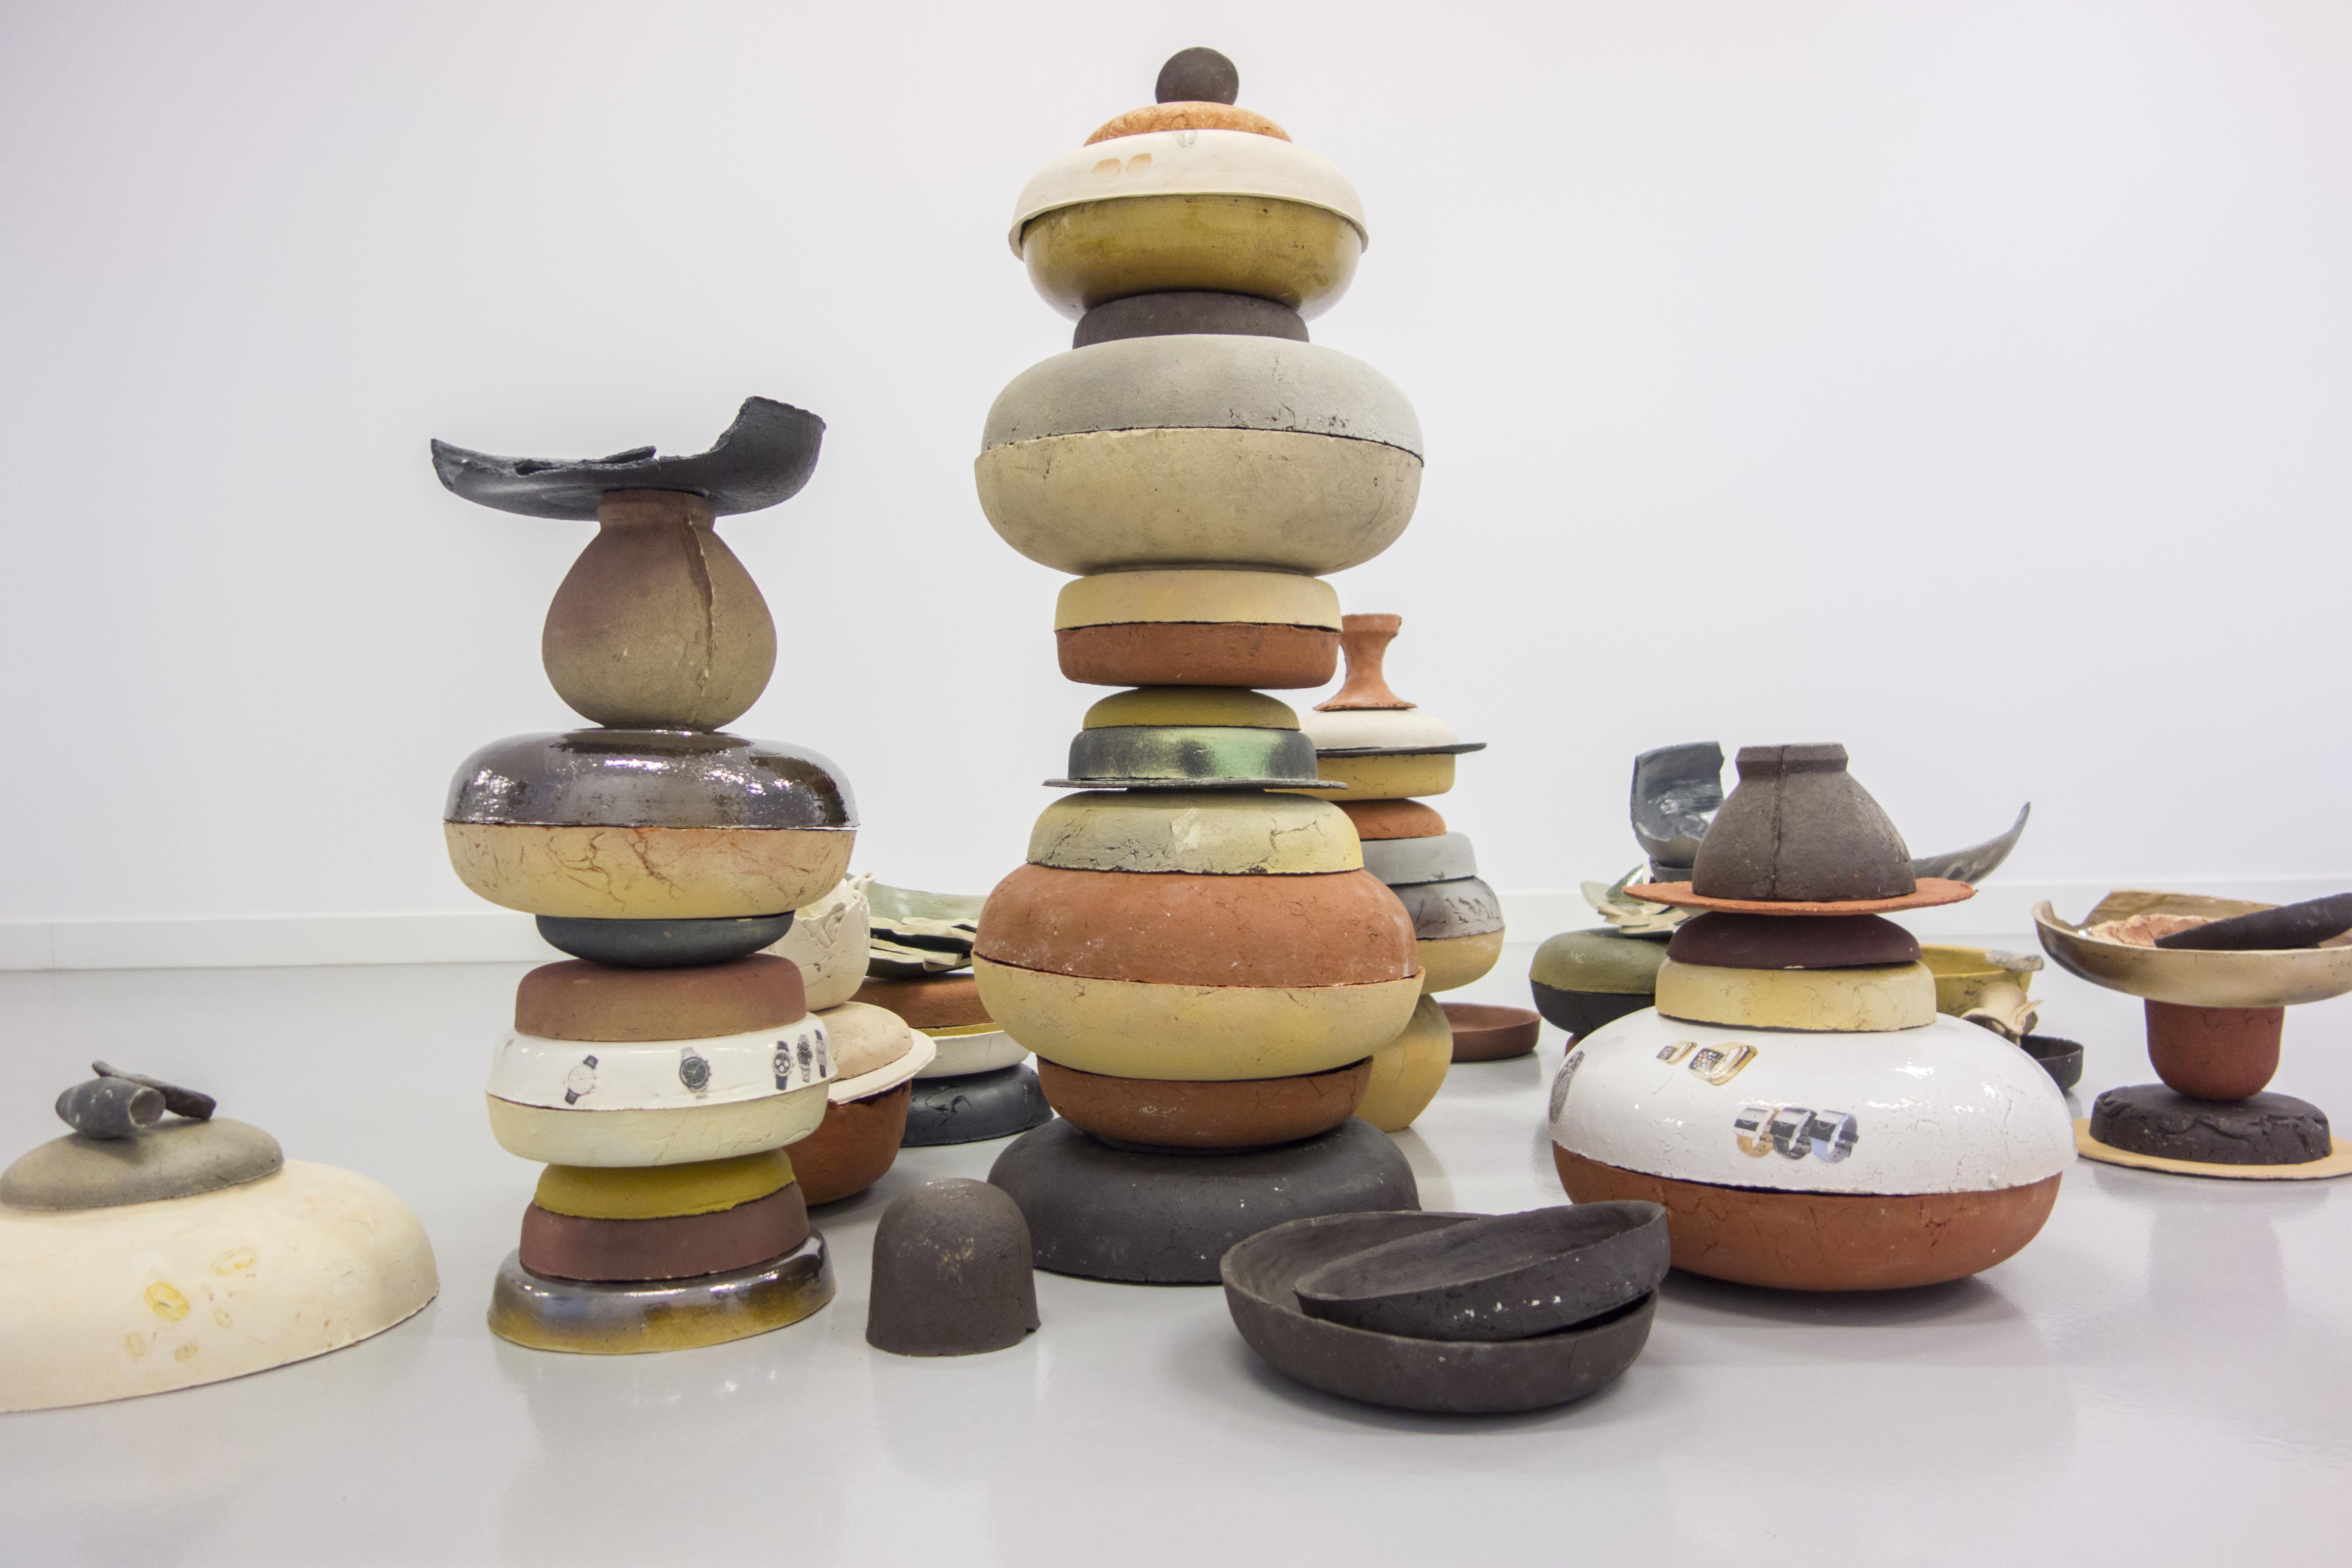 Thomas van Linge, Untitled (Bowls), 2014, wymiary zmienne, detal